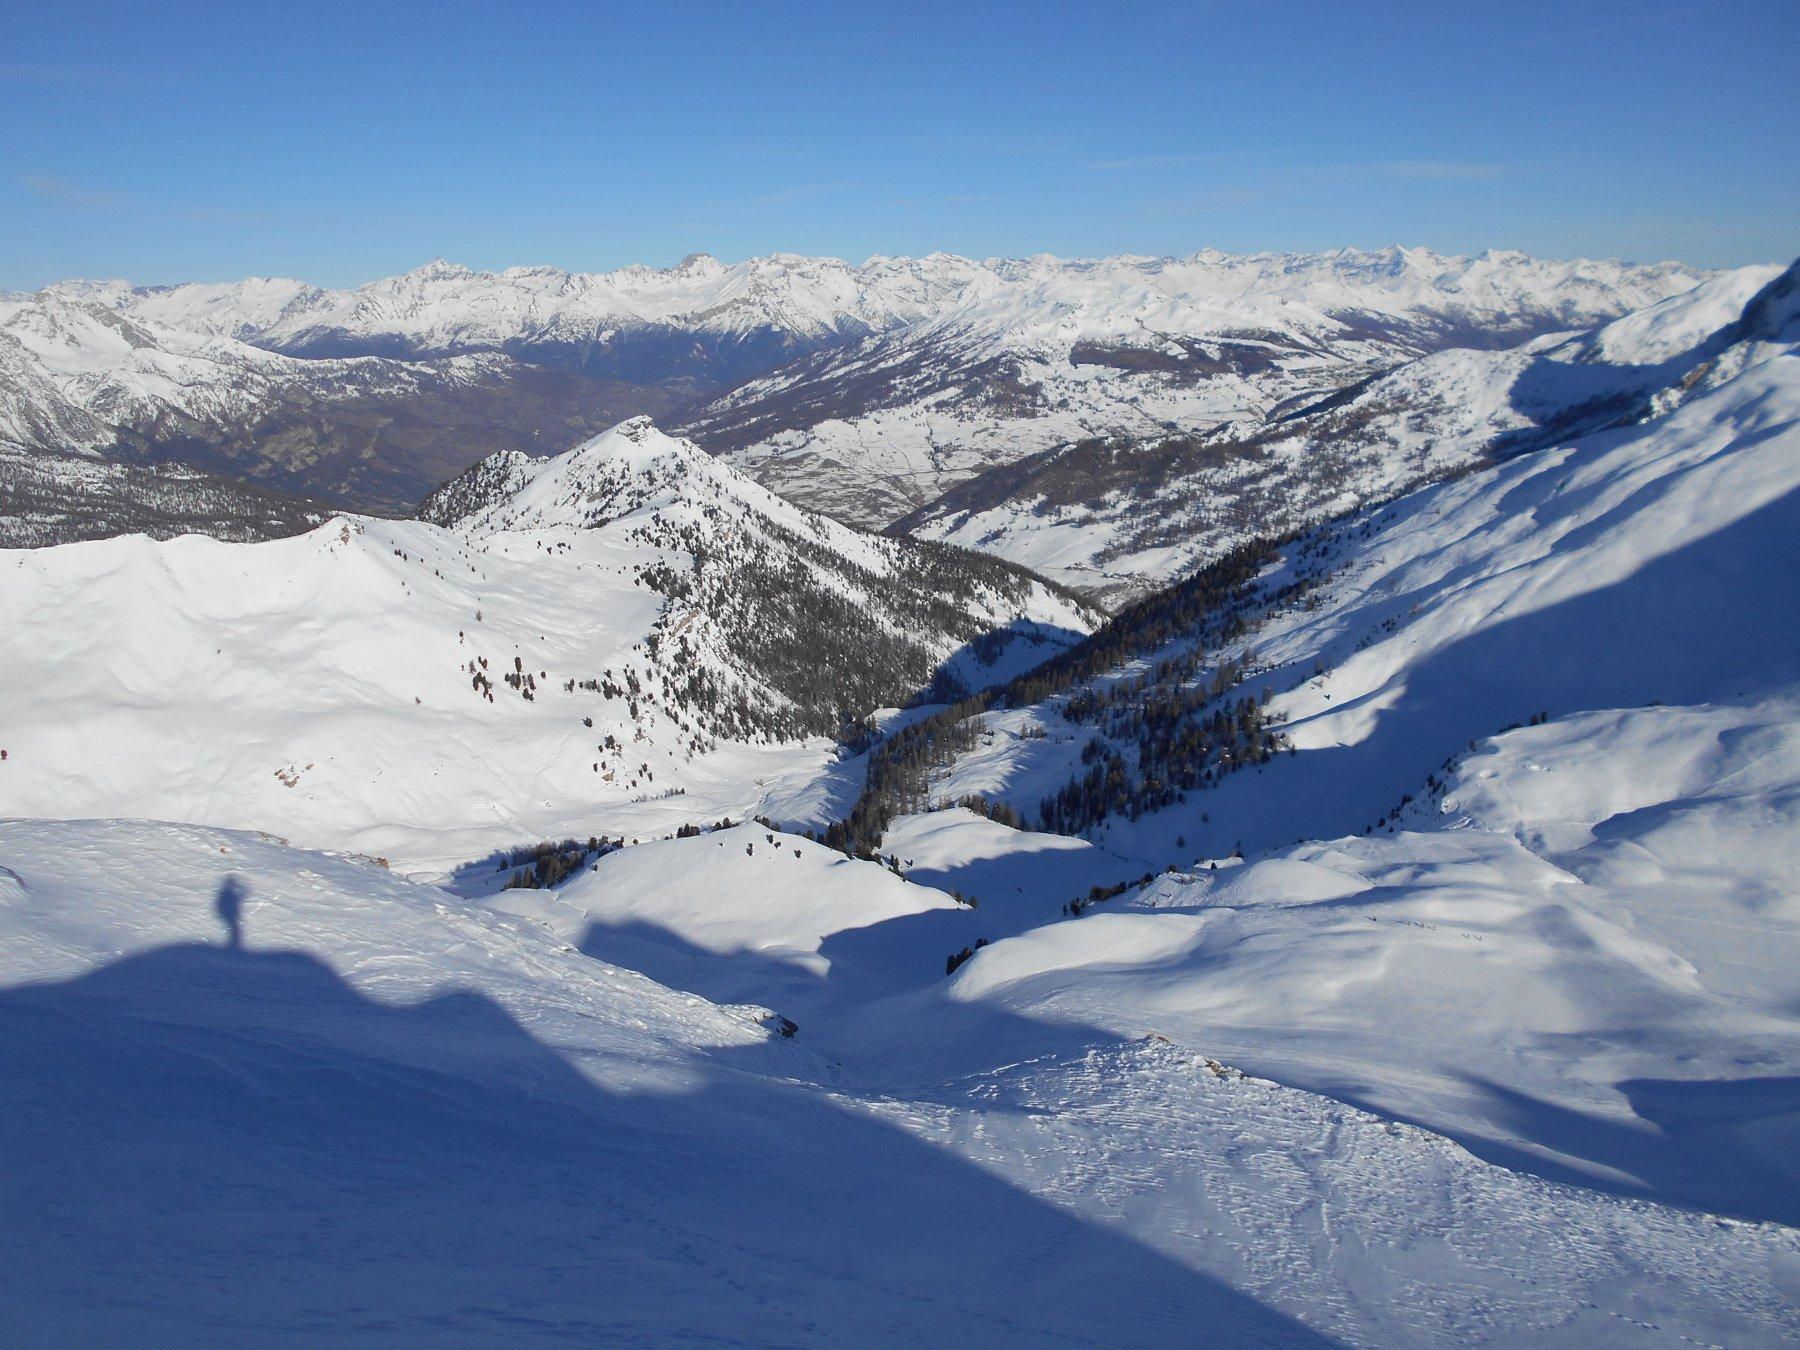 Dormillouse (Créte de la) quota 2708 m dalla Val Thuras 2016-12-08